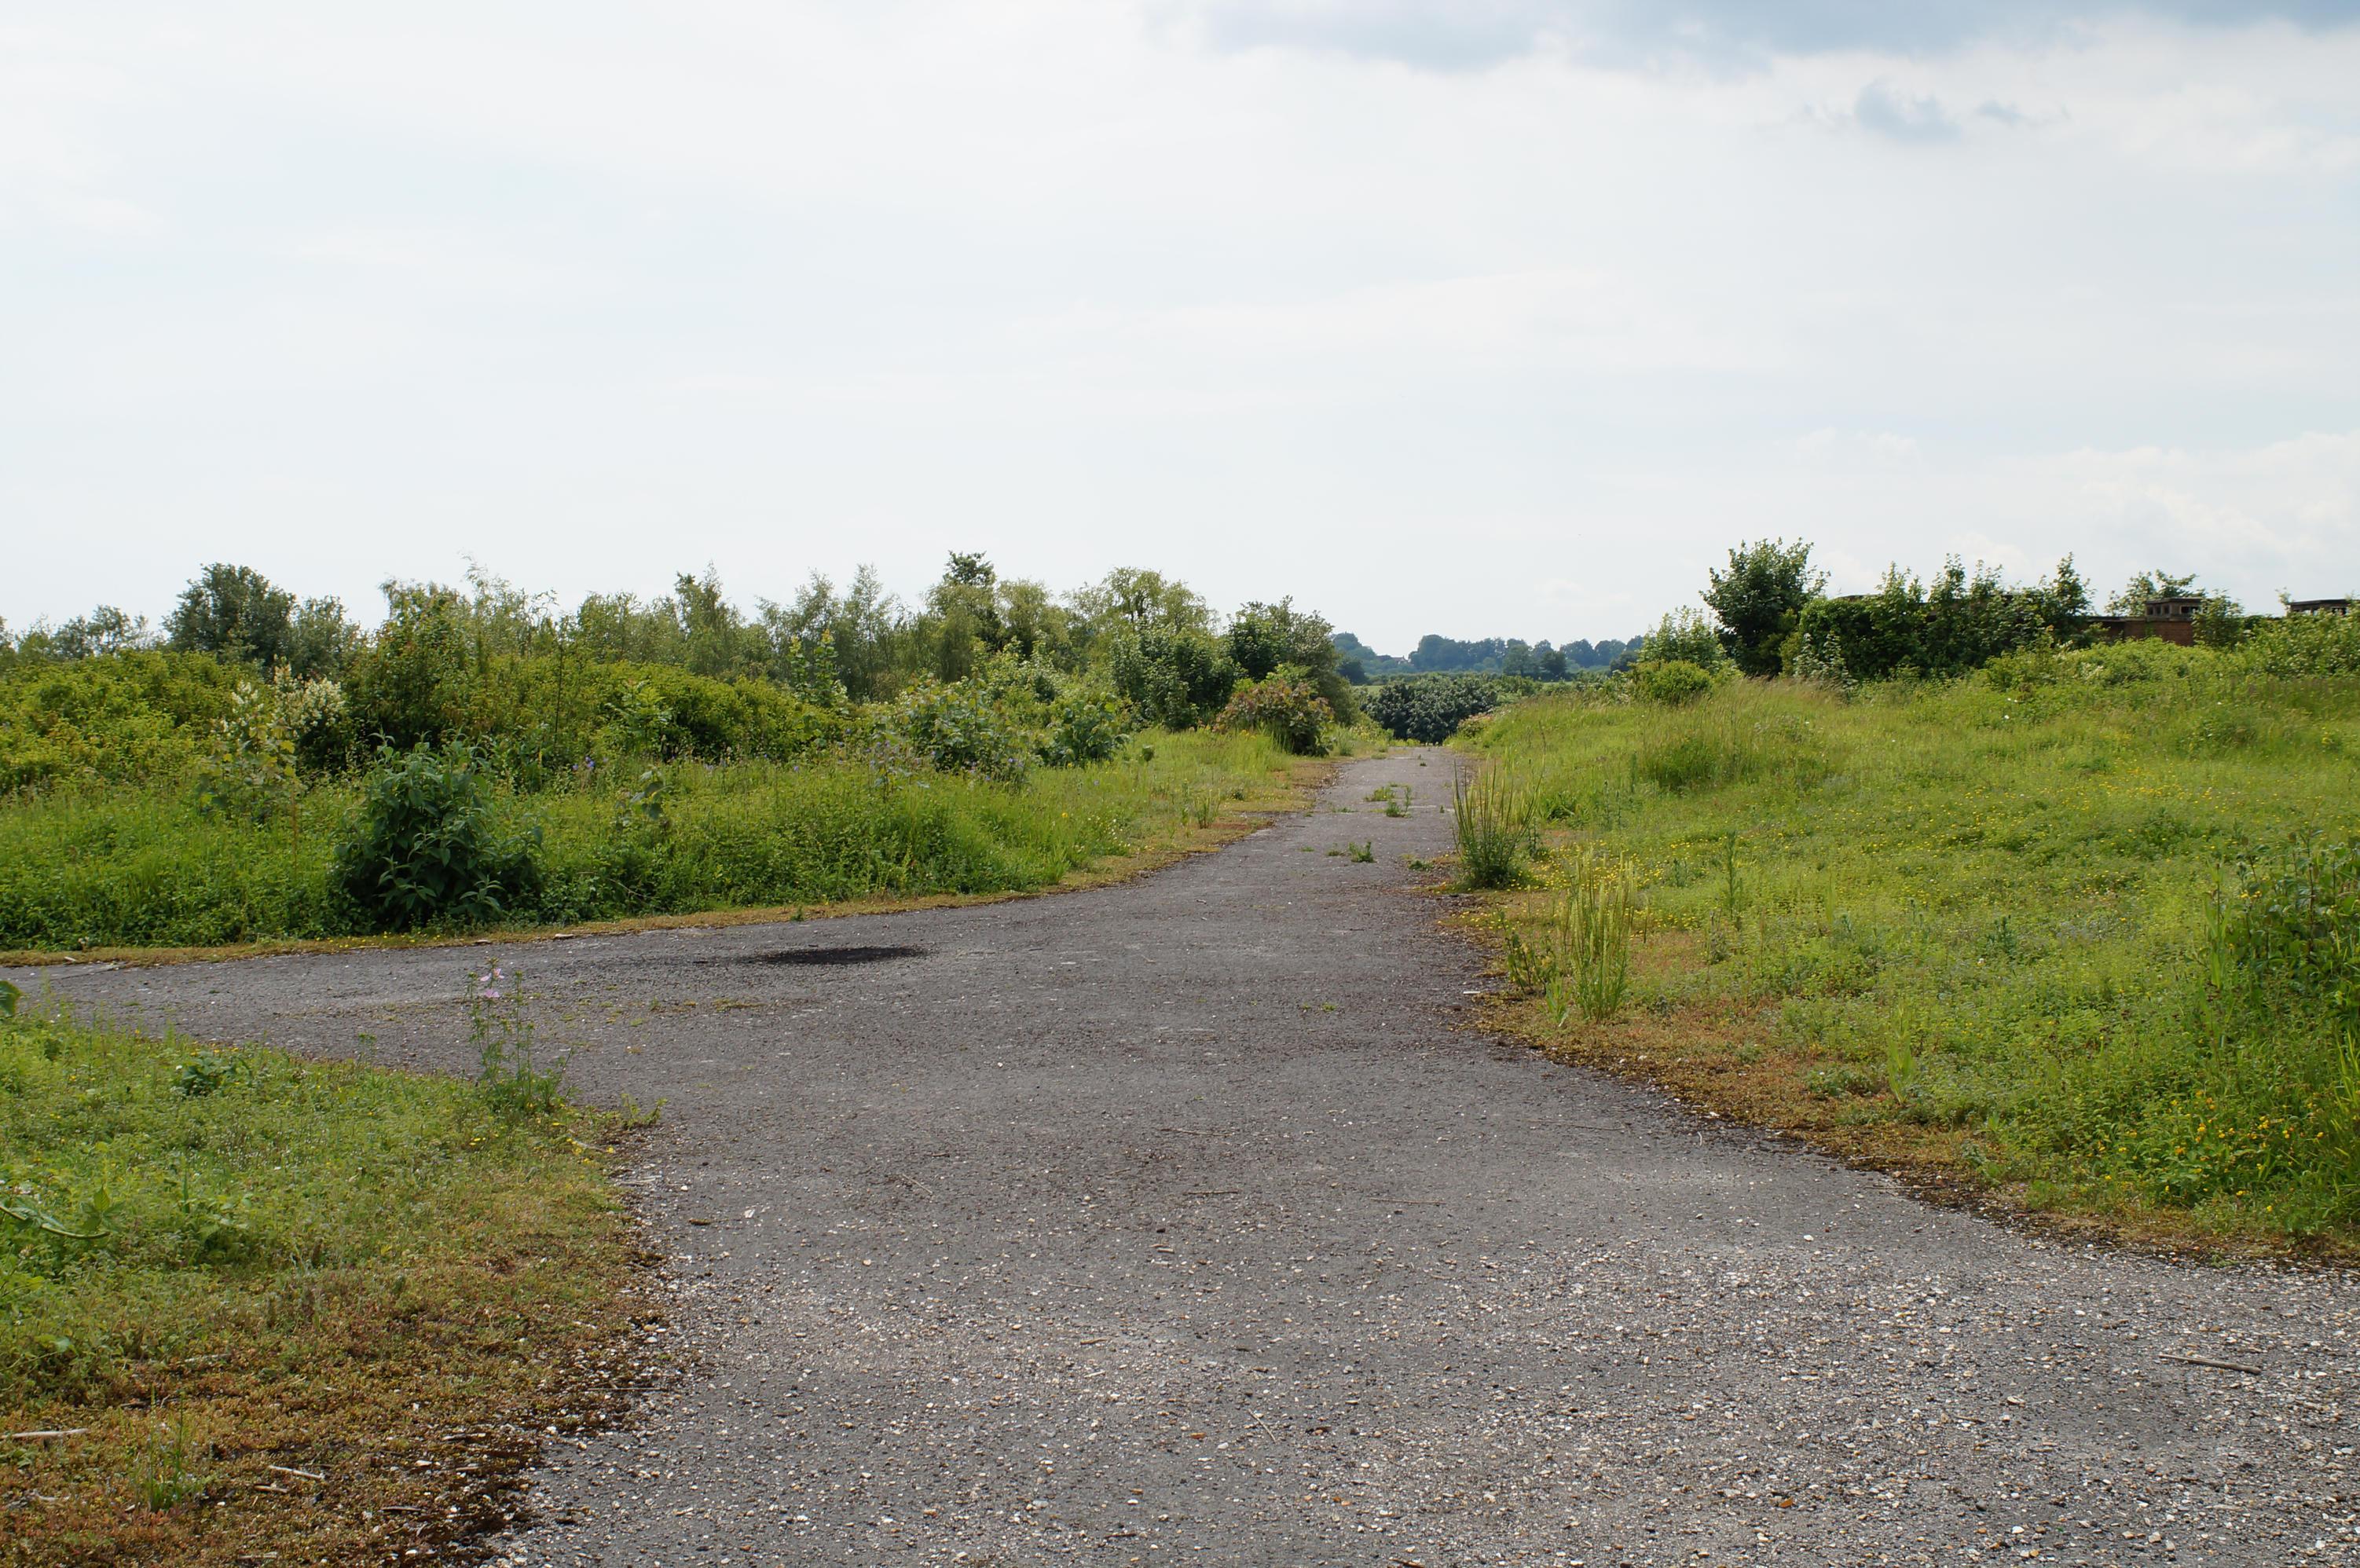 Stock - Old Road 1 by cfowler7-SFM